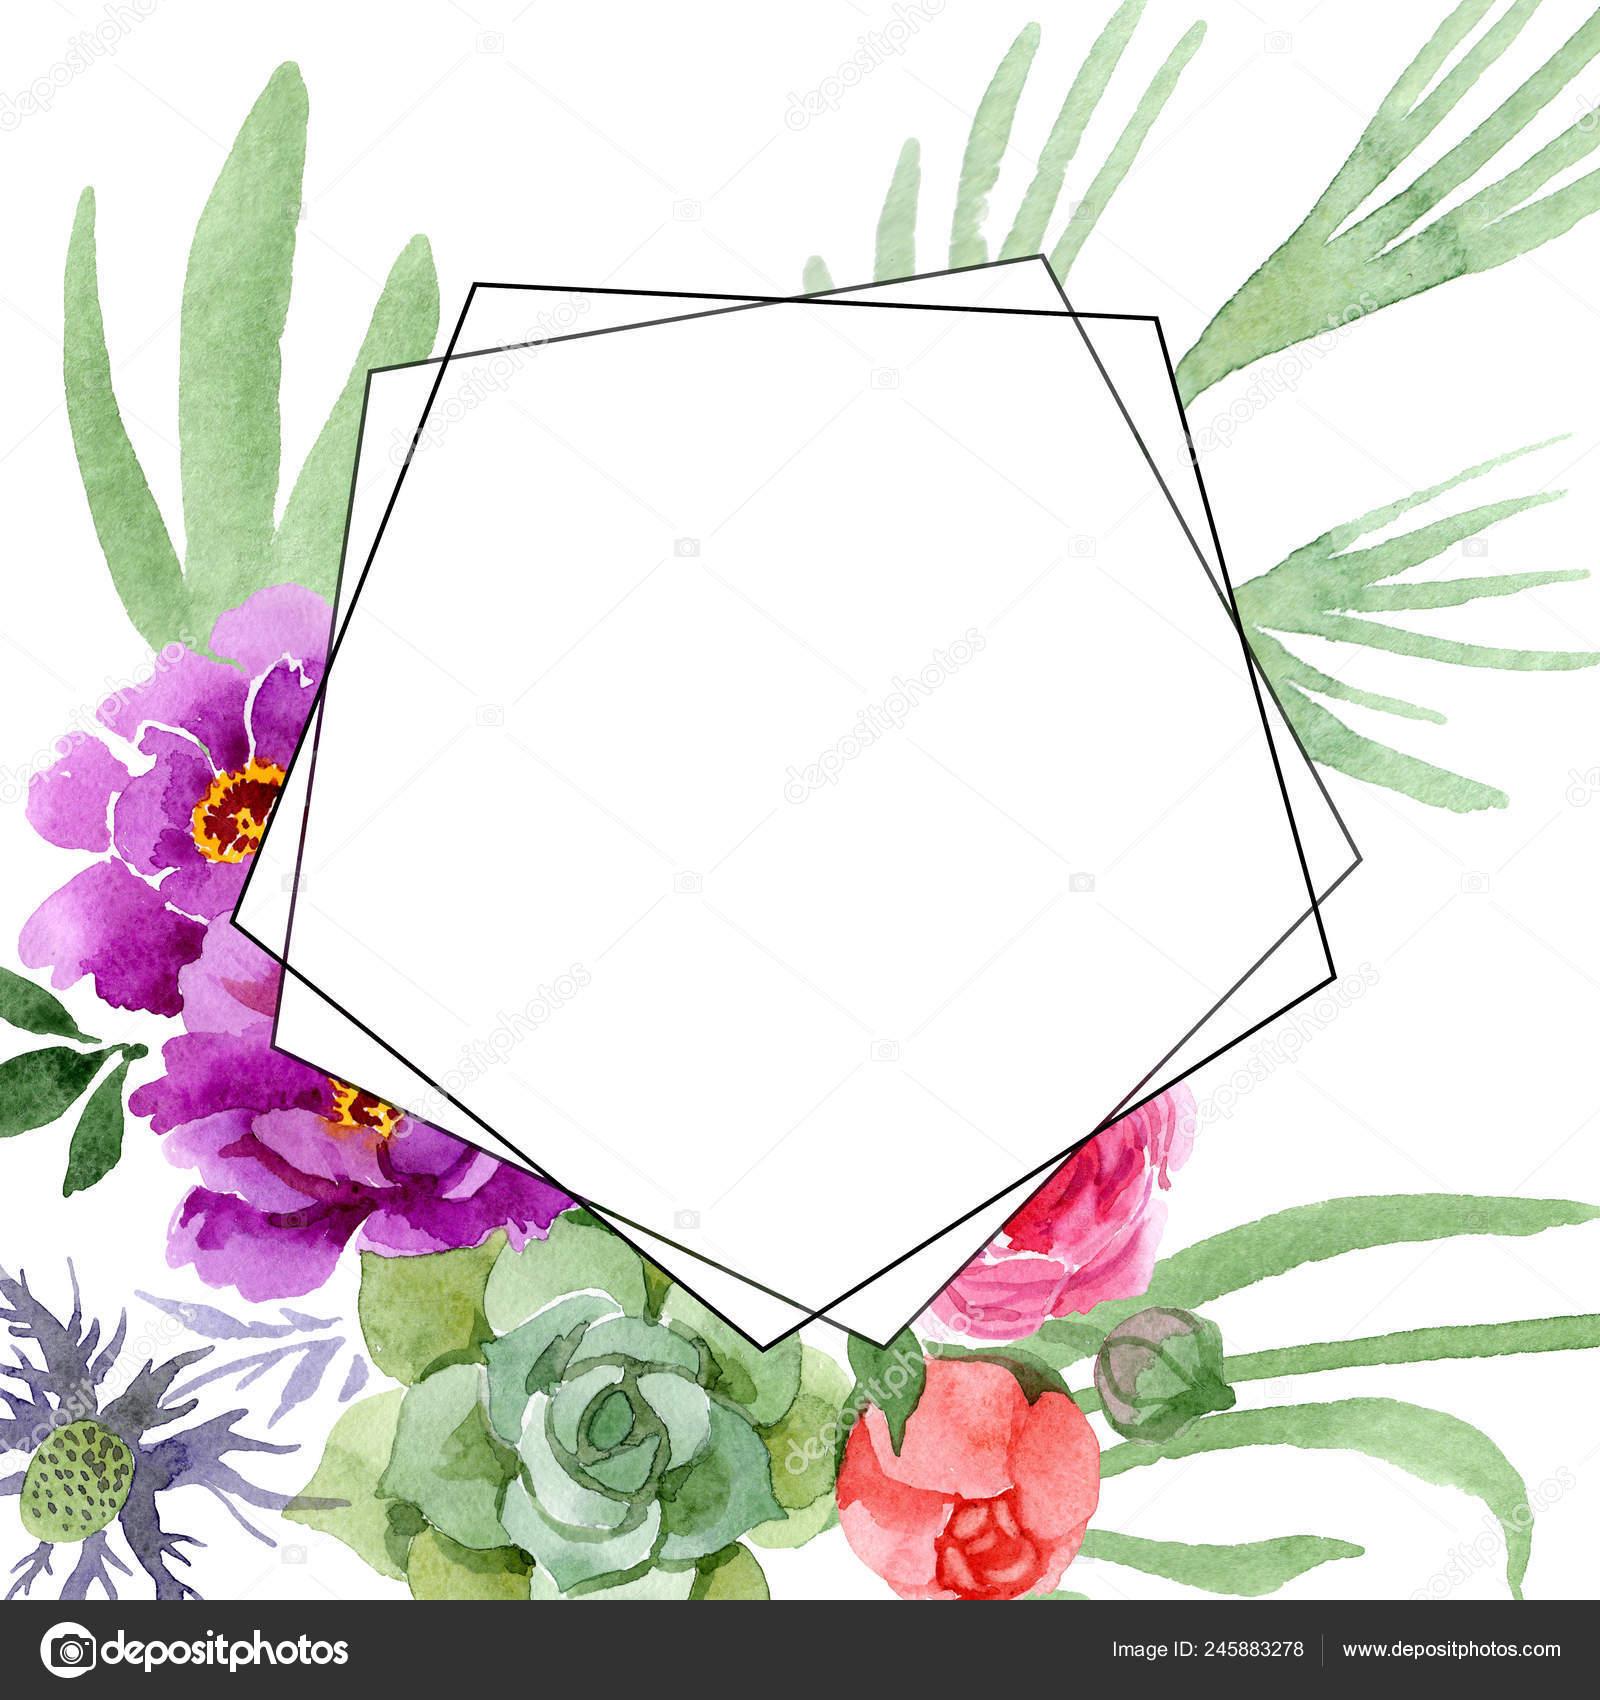 Peony And Succulent Bouquet Botanical Flower Watercolor Background Illustration Set Frame Border Ornament Square Stock Photo C Mystocks 245883278